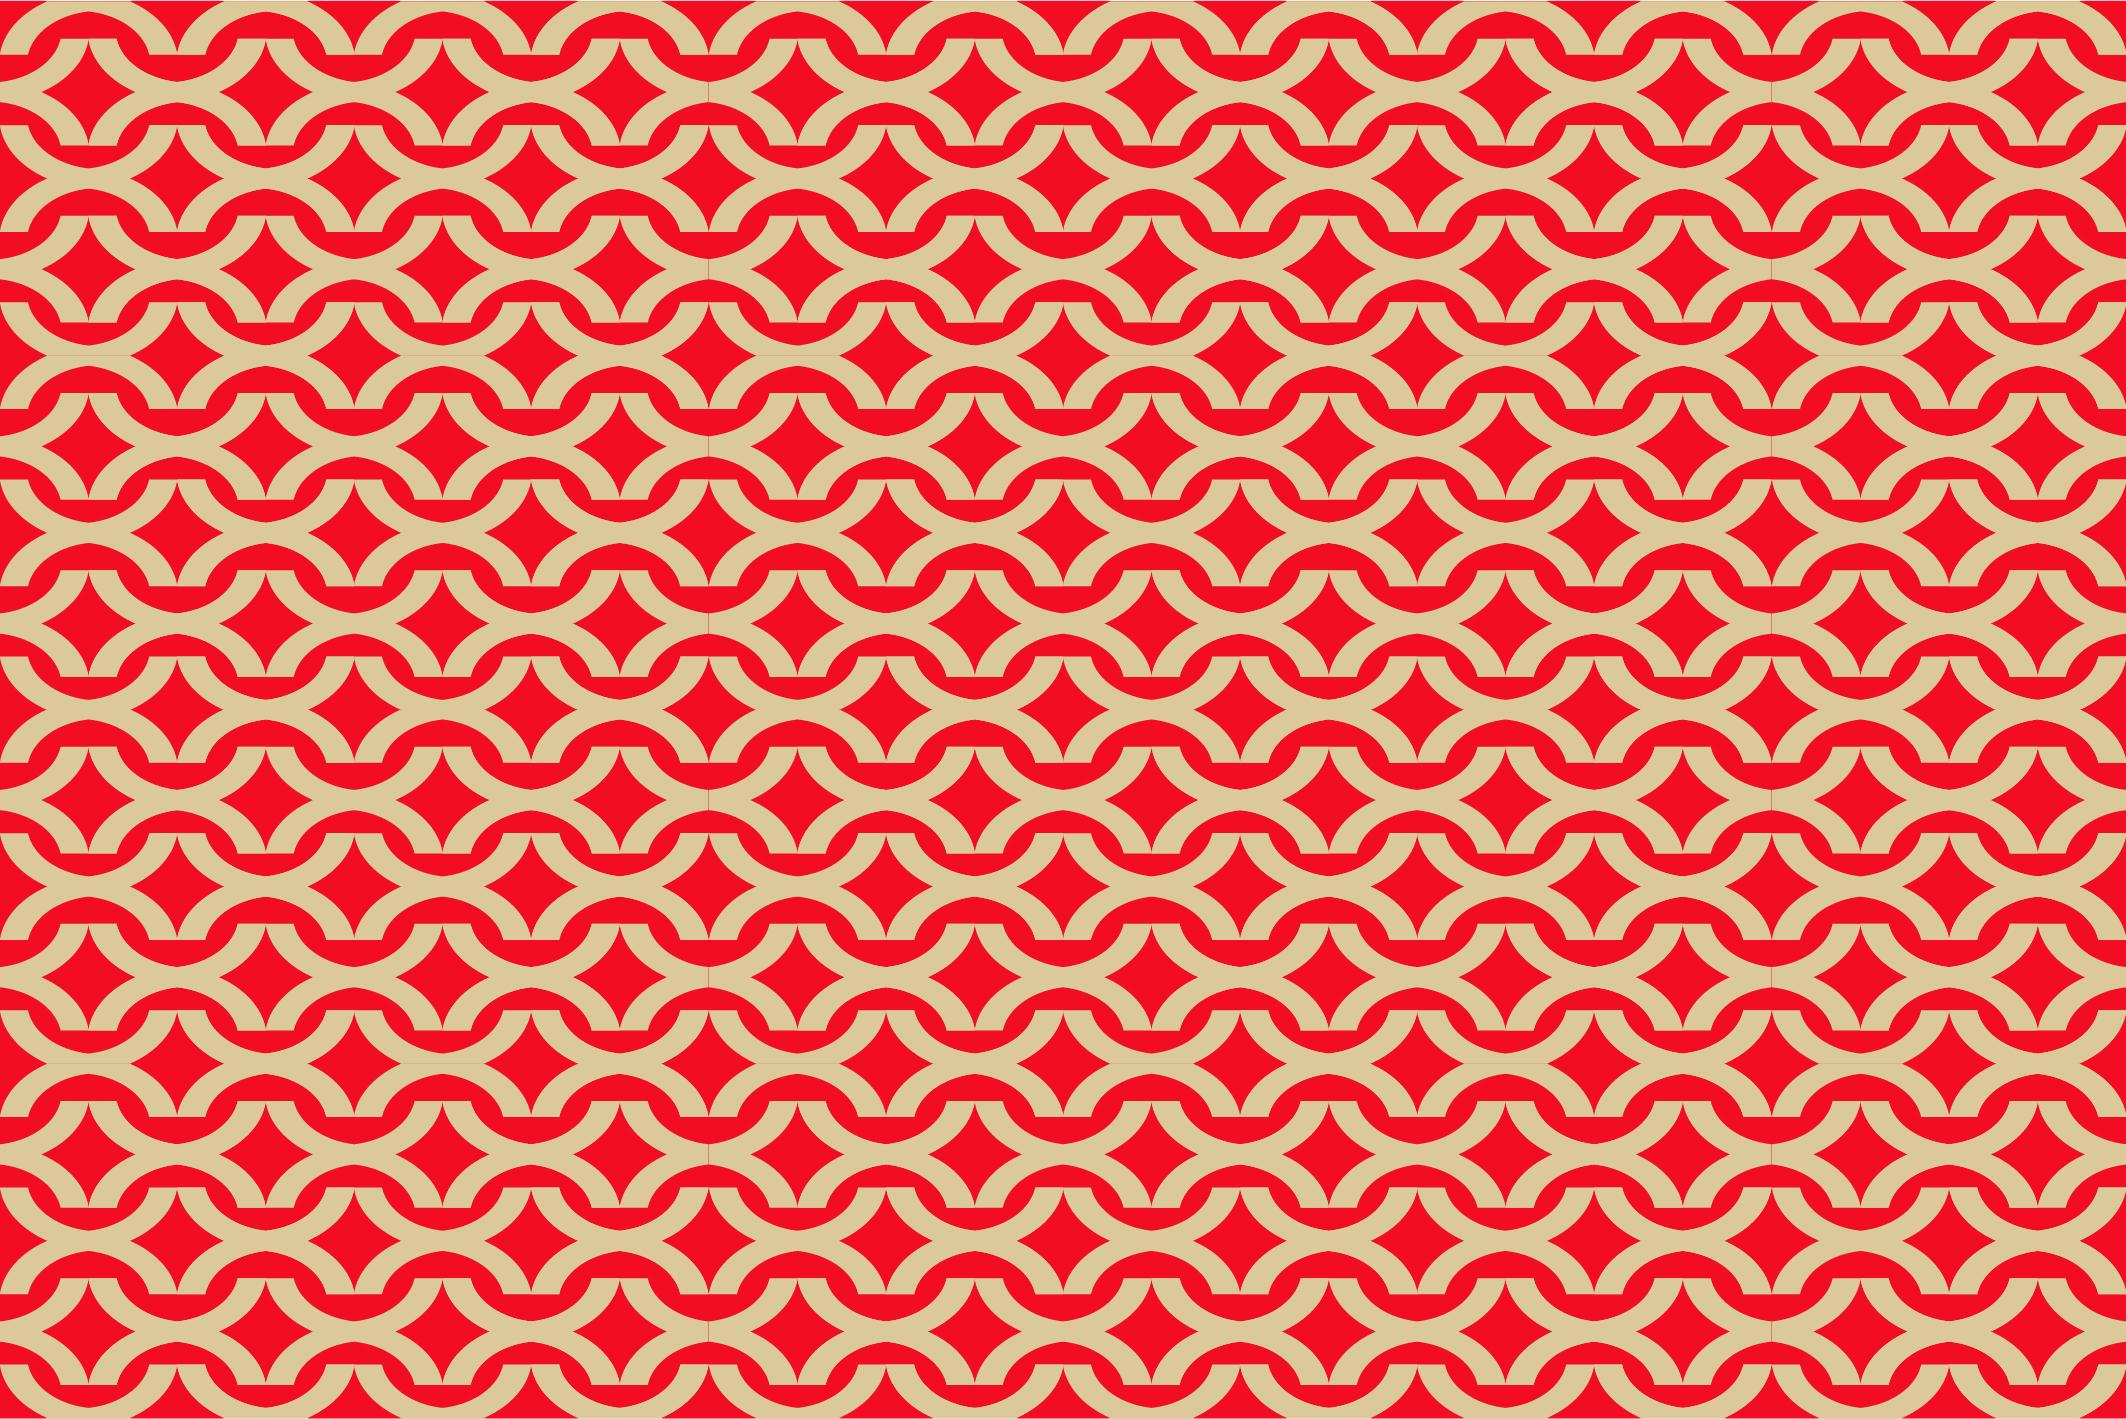 Luxury ornamental seamless patterns. example image 5